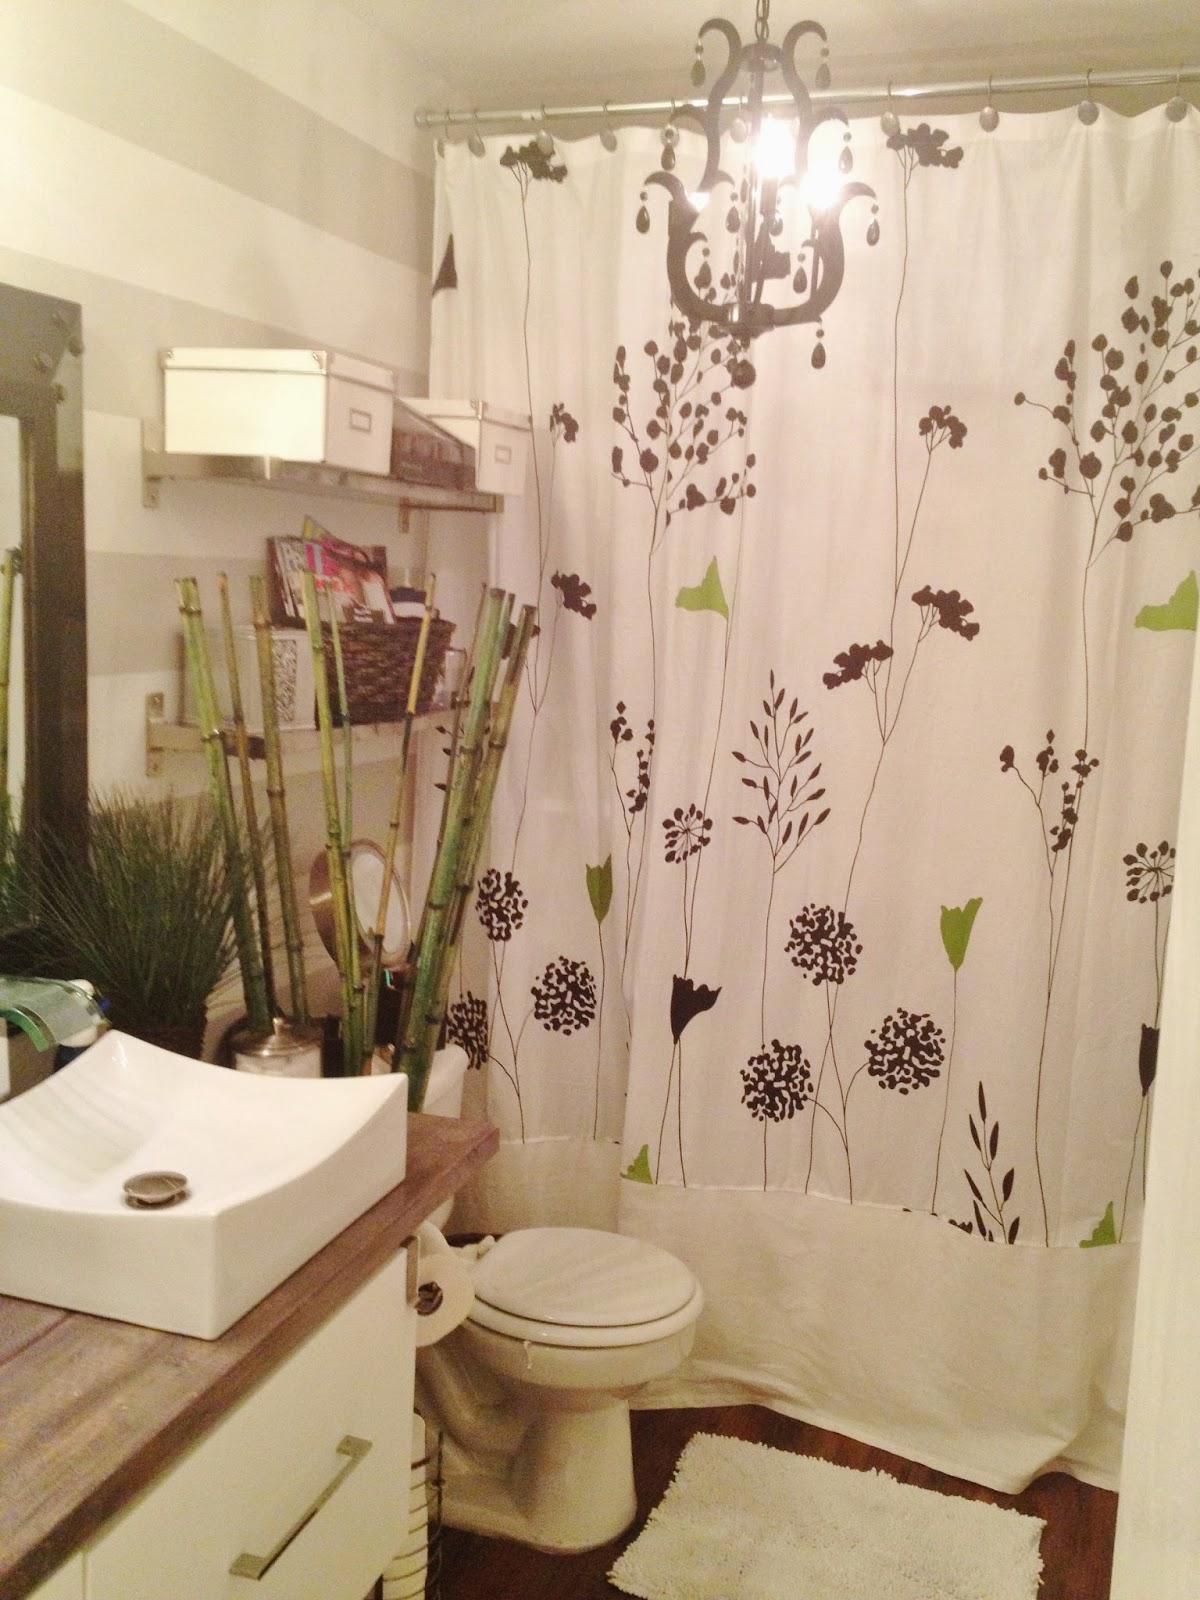 Low Budget Bathroom Remodel Budget Bathroom Remodel Bathroom Bathroom Remodeling Ideas On A